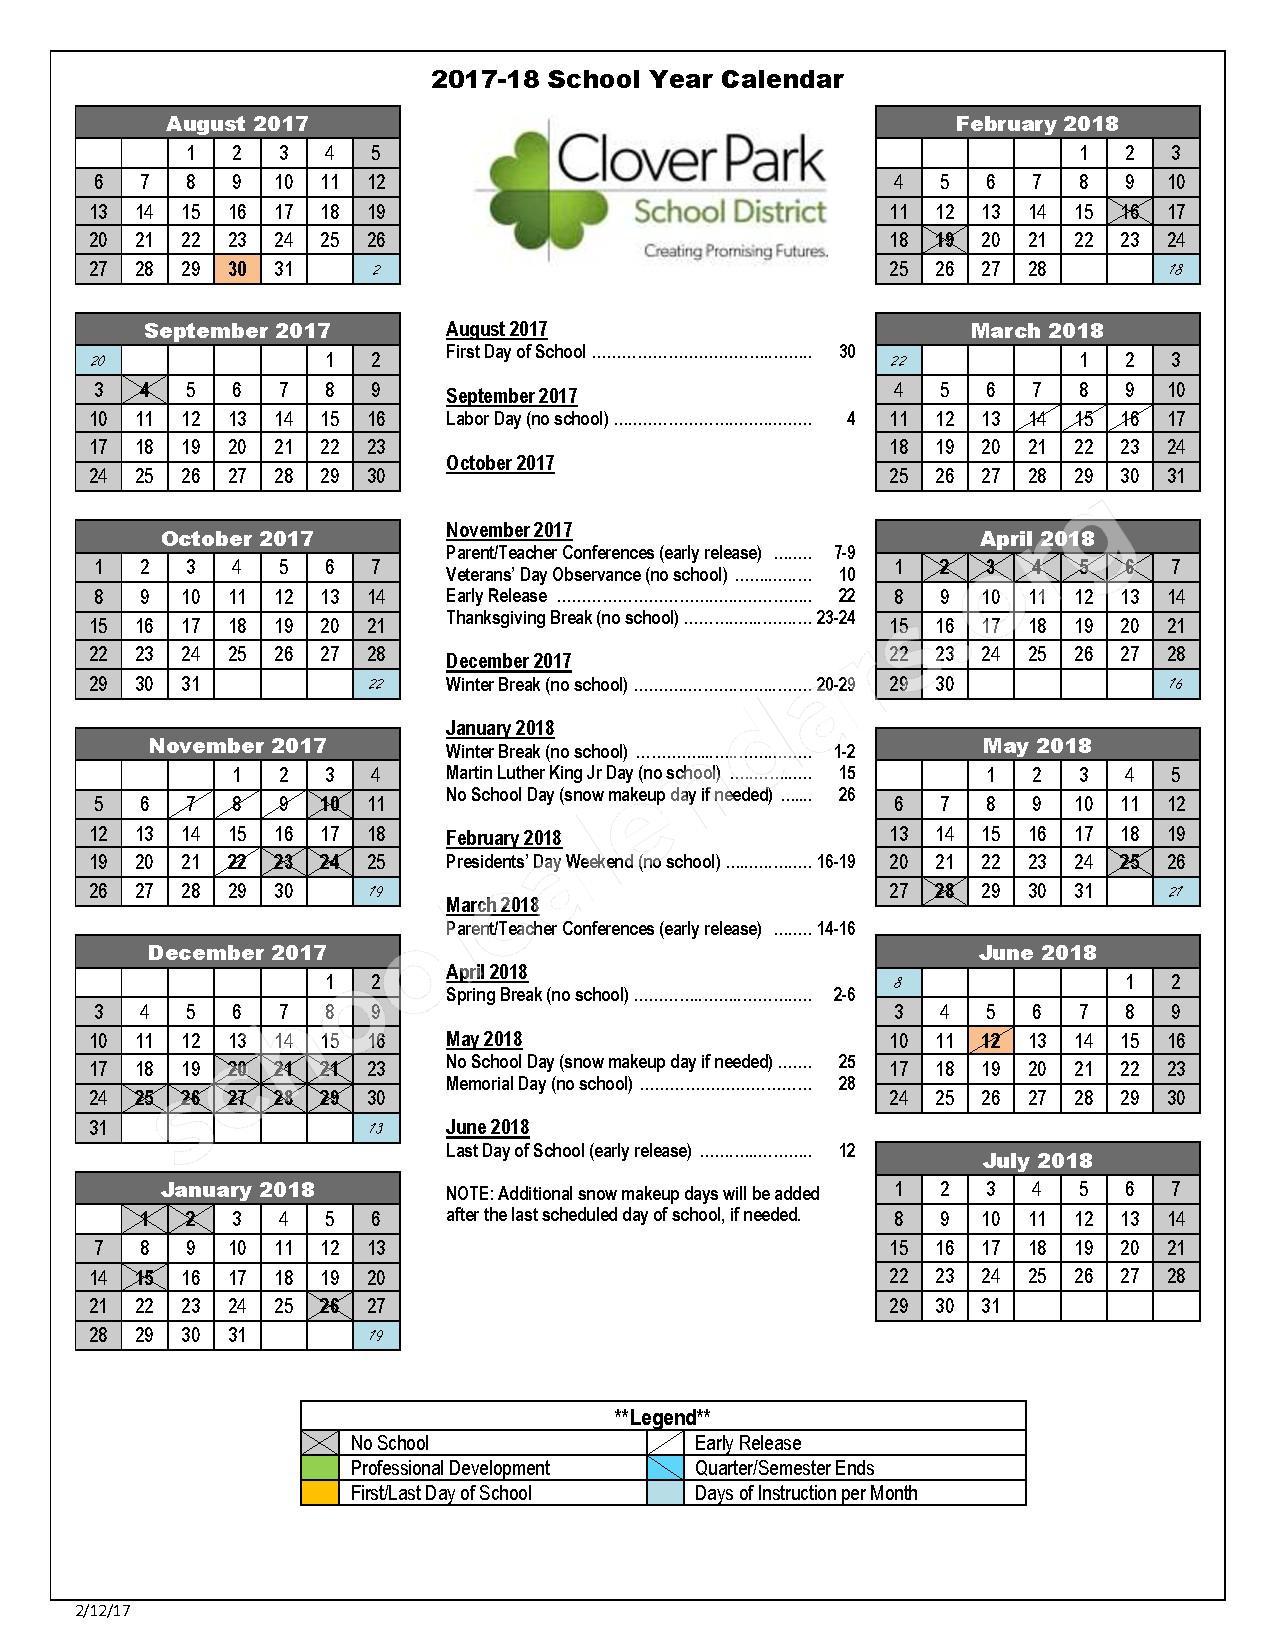 2017 - 2018 School Calendar – Custer Elementary School – page 1